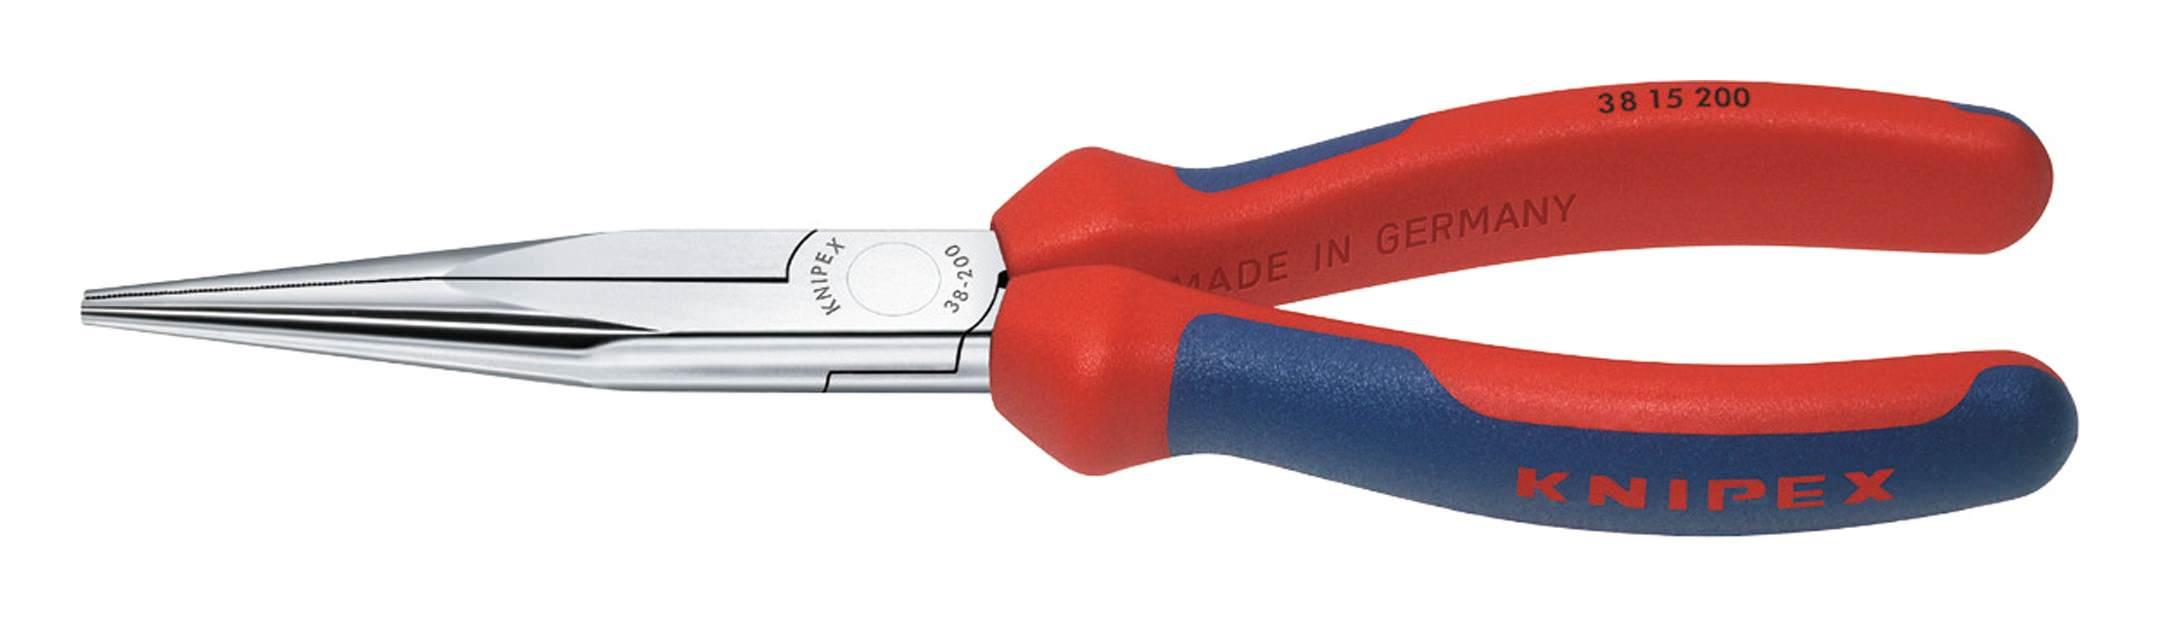 Knipex Mechanikerzange Form 1 200mm - 38 15 200